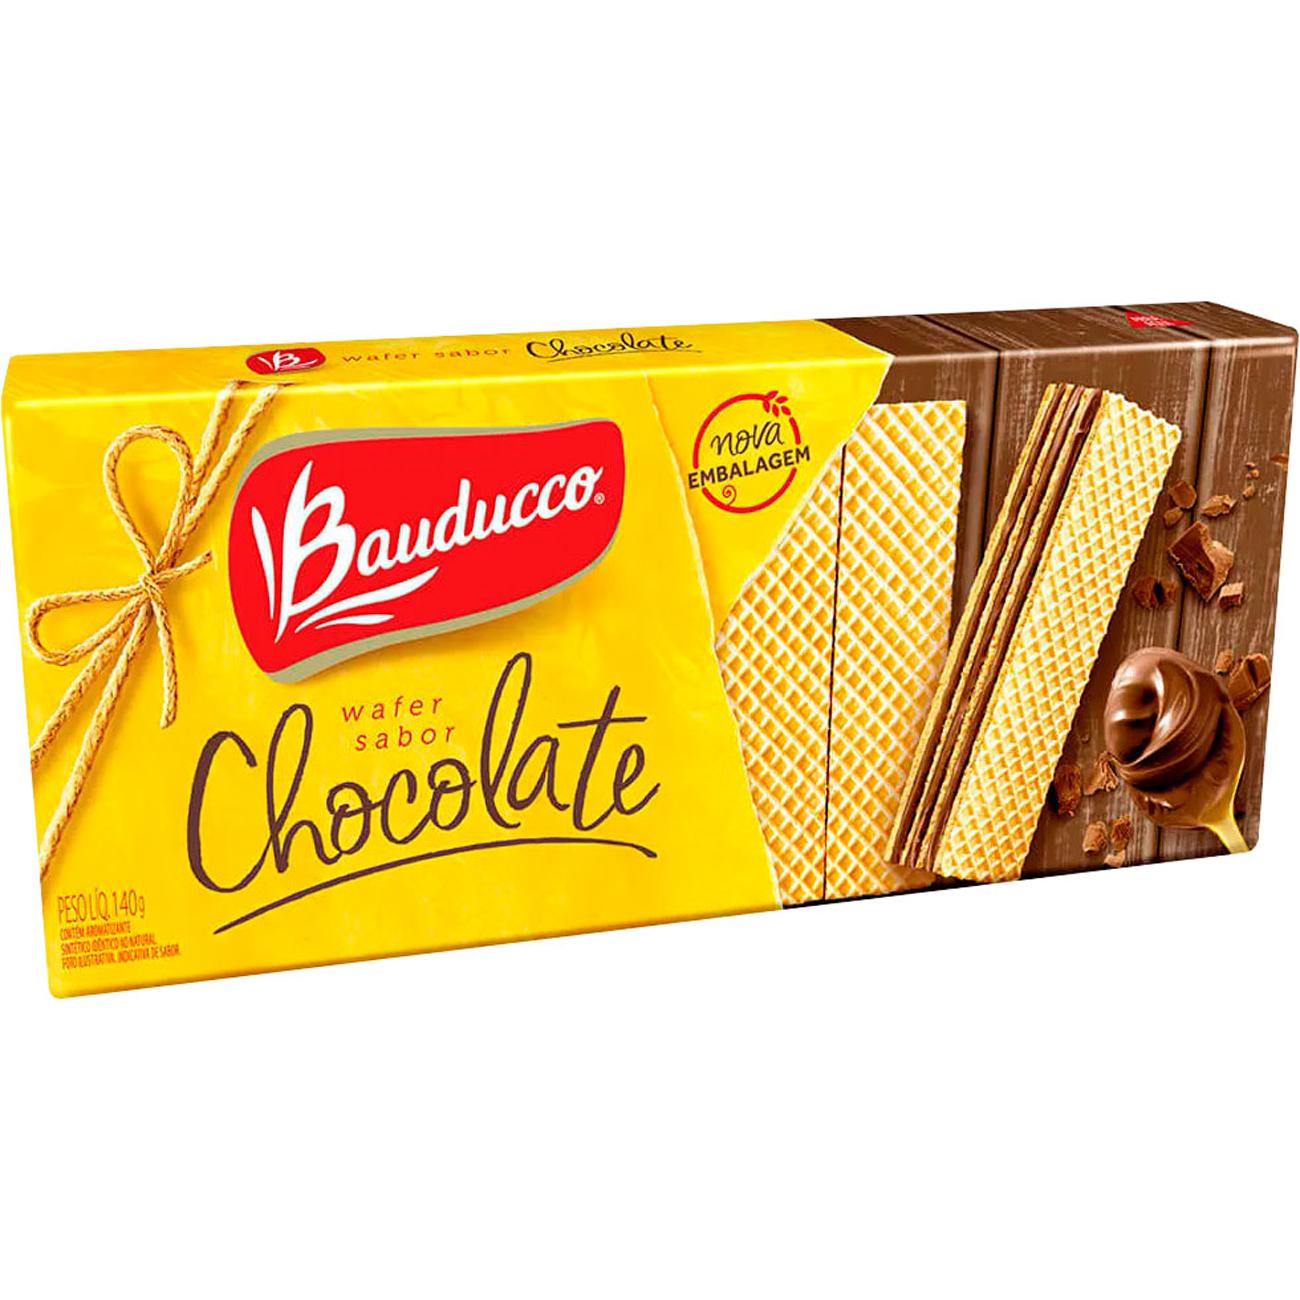 Biscoito Bauducco 140G Wafer Chocolate